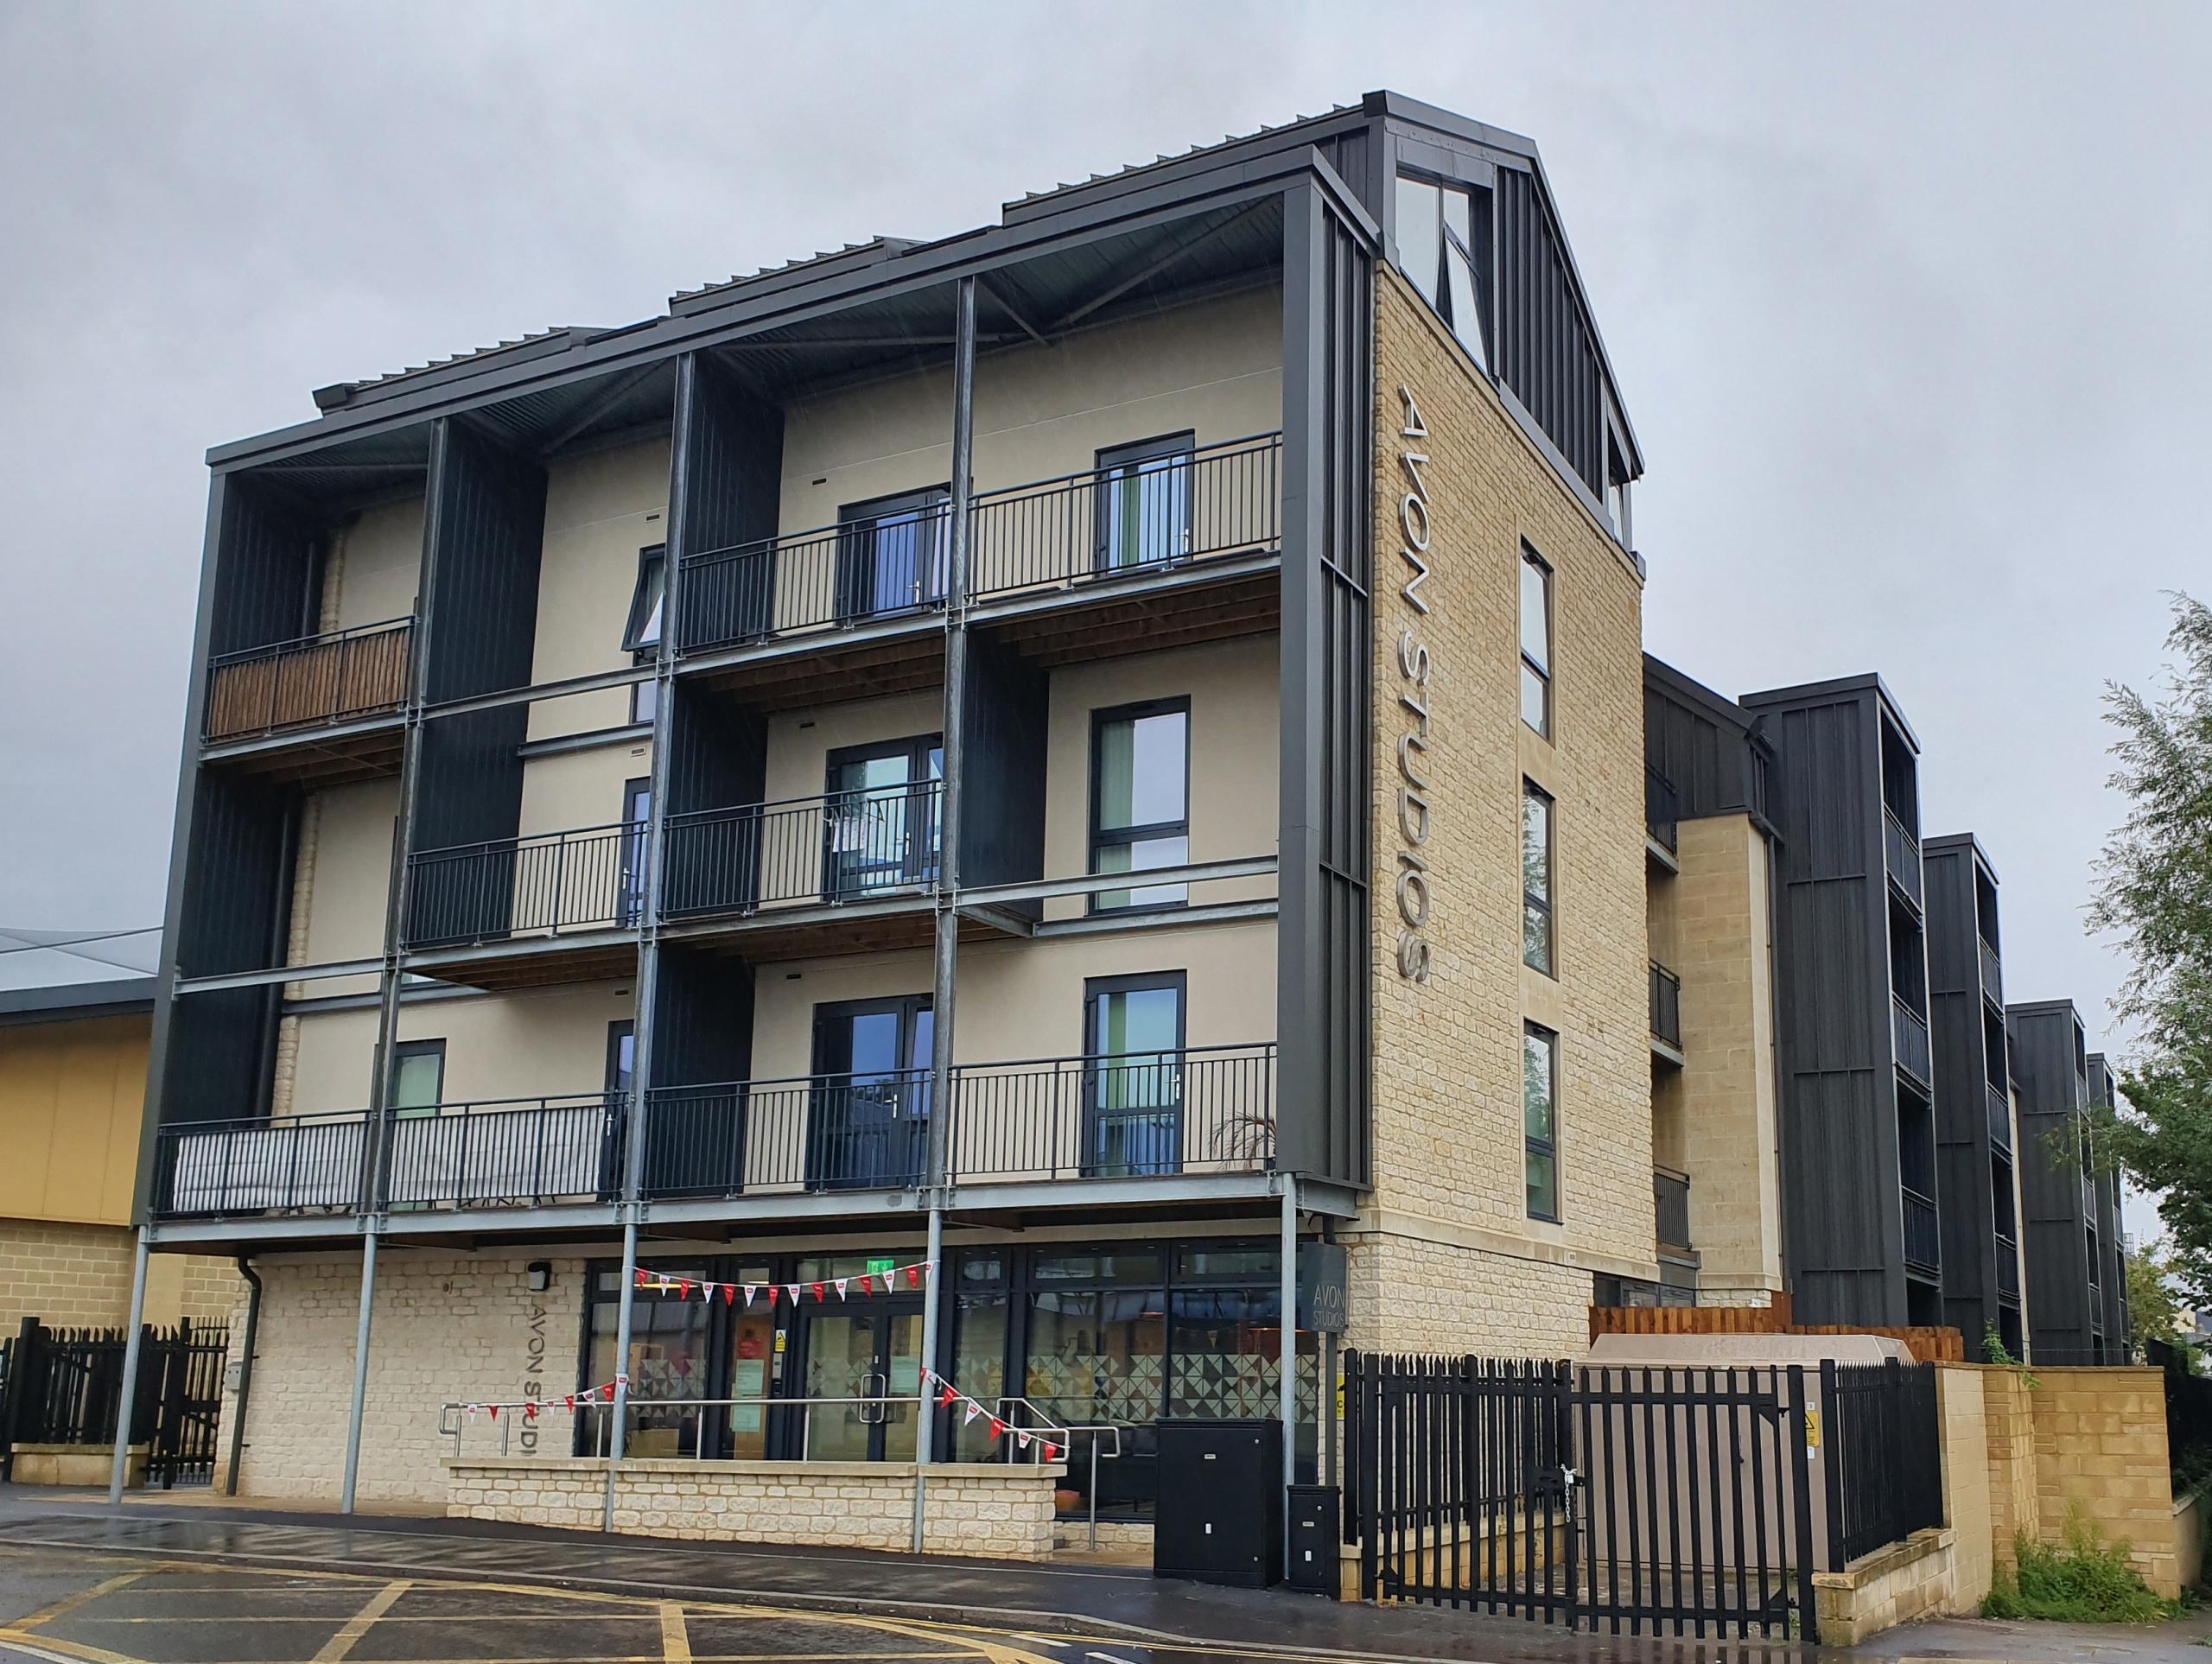 Avon Studios, Midland Road, Bath